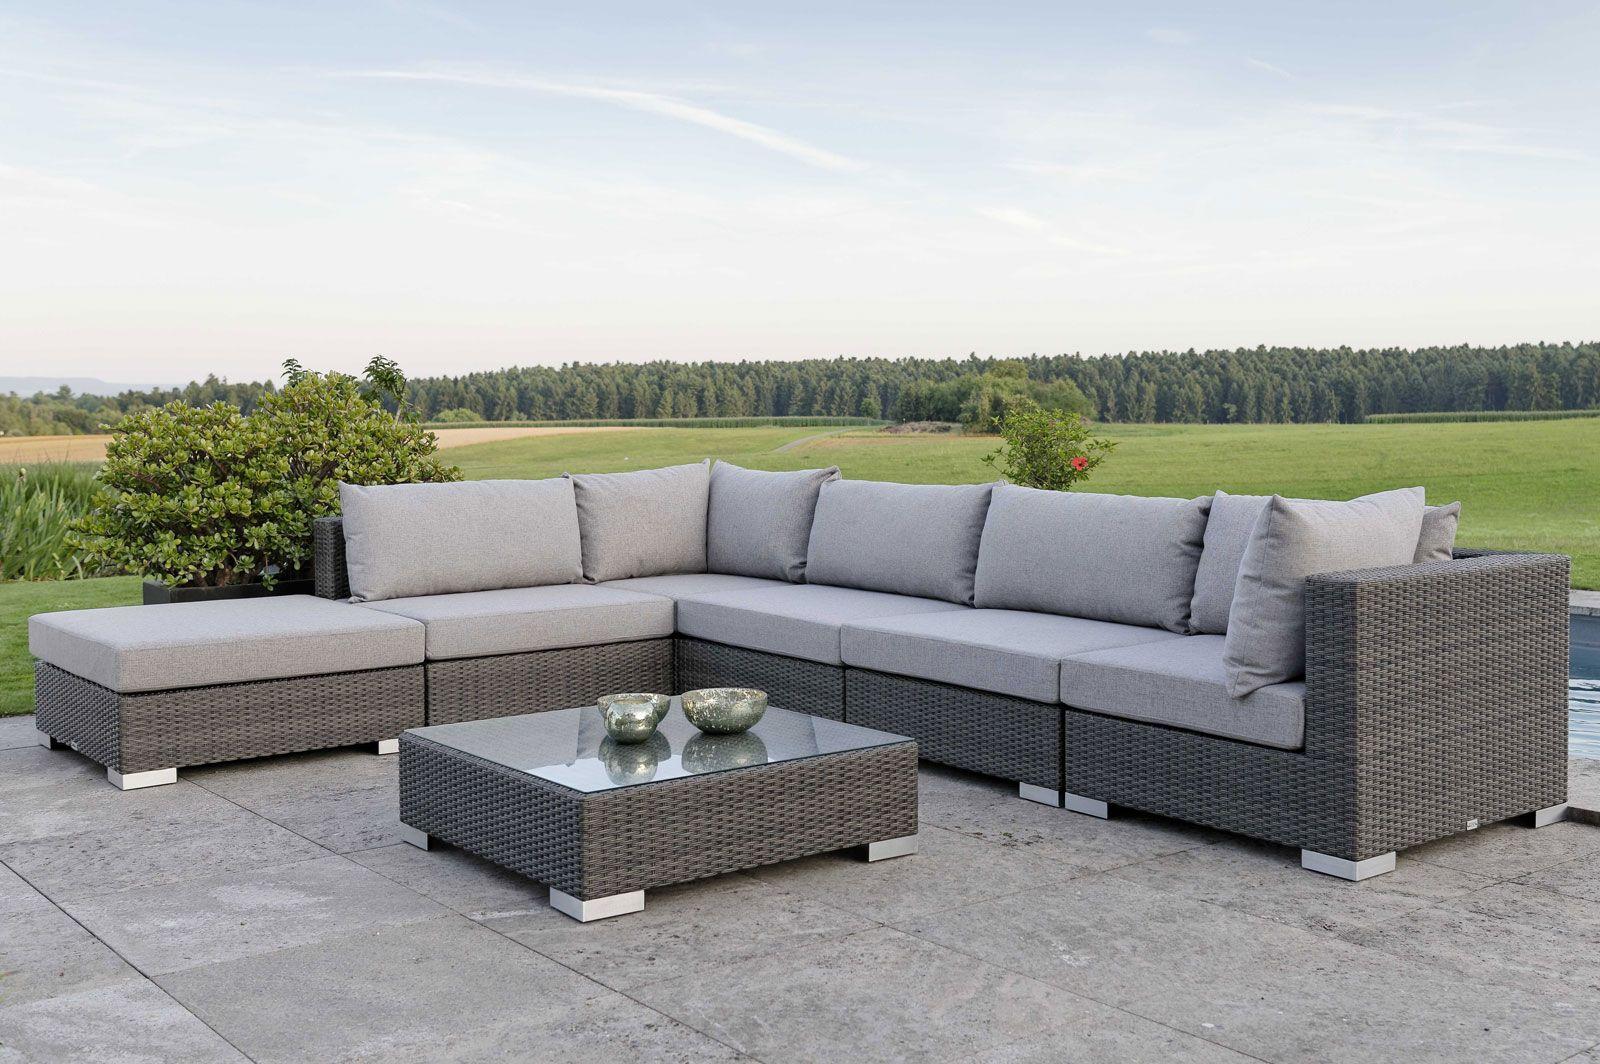 Full Size of Stern Jubi Loungegruppe Grau Meliert 7 Tlg Gartenmoebelde Wohnzimmer Stern Jubi Loungeecke 5 Teilig Geflecht